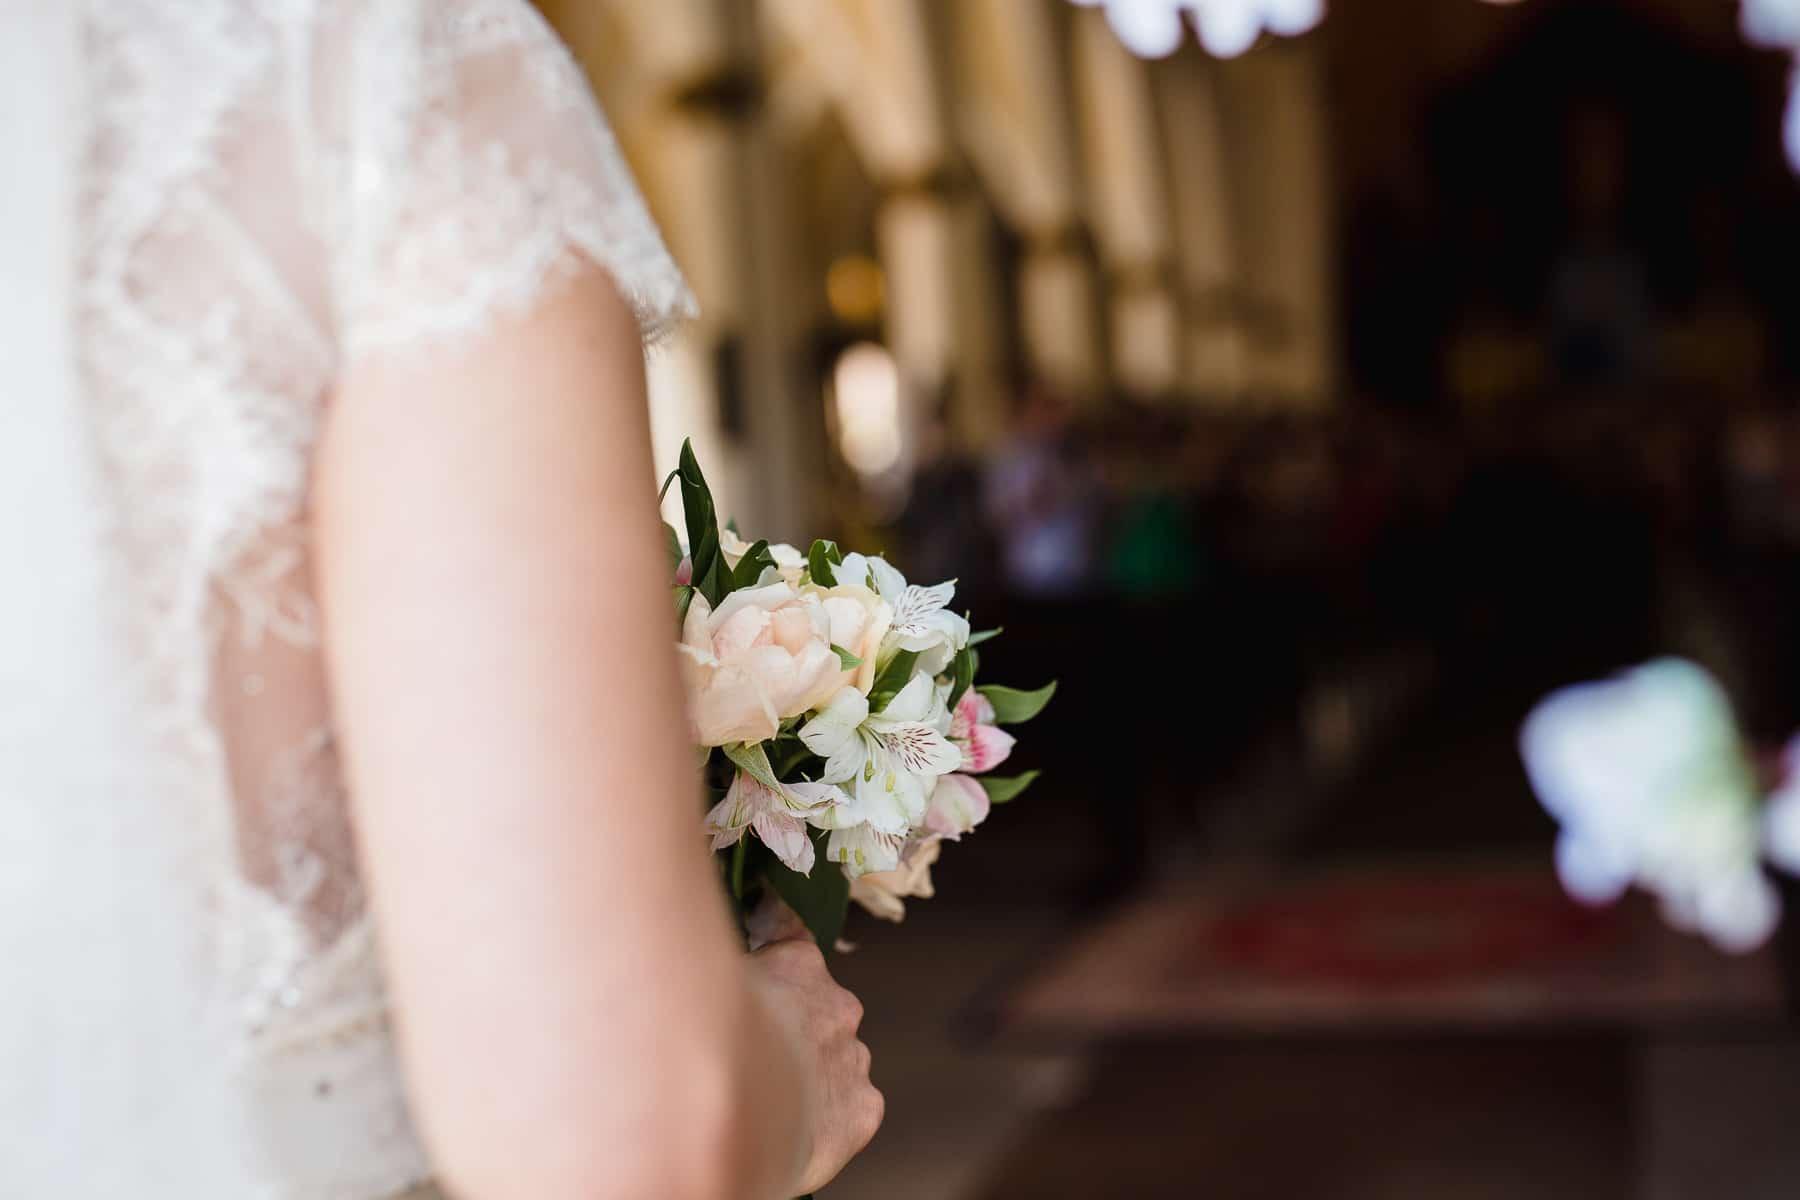 casamento-igreja-do-cristo-rei-fortaleza-19